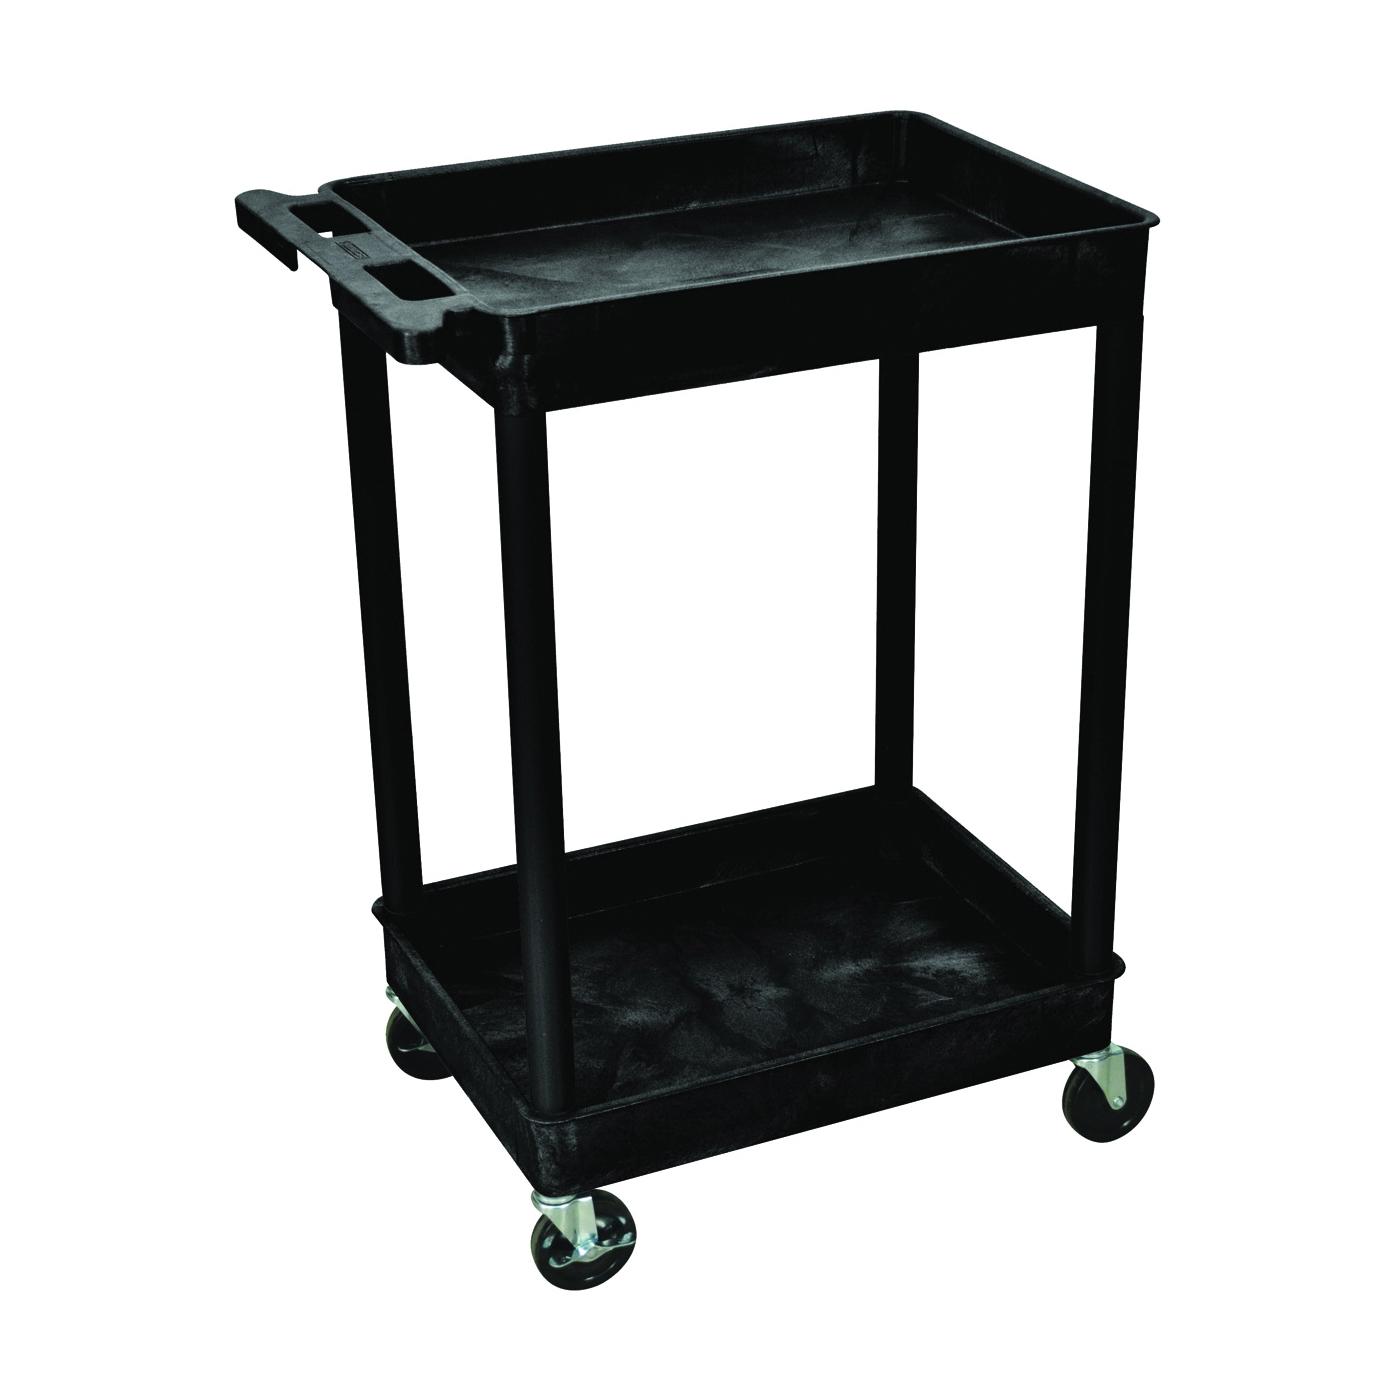 Picture of LUXOR RPSTCS11-B Utility Tub Cart, 300 lb, 2-Shelf, Black, 24 in OAW, 37-1/2 in OAH